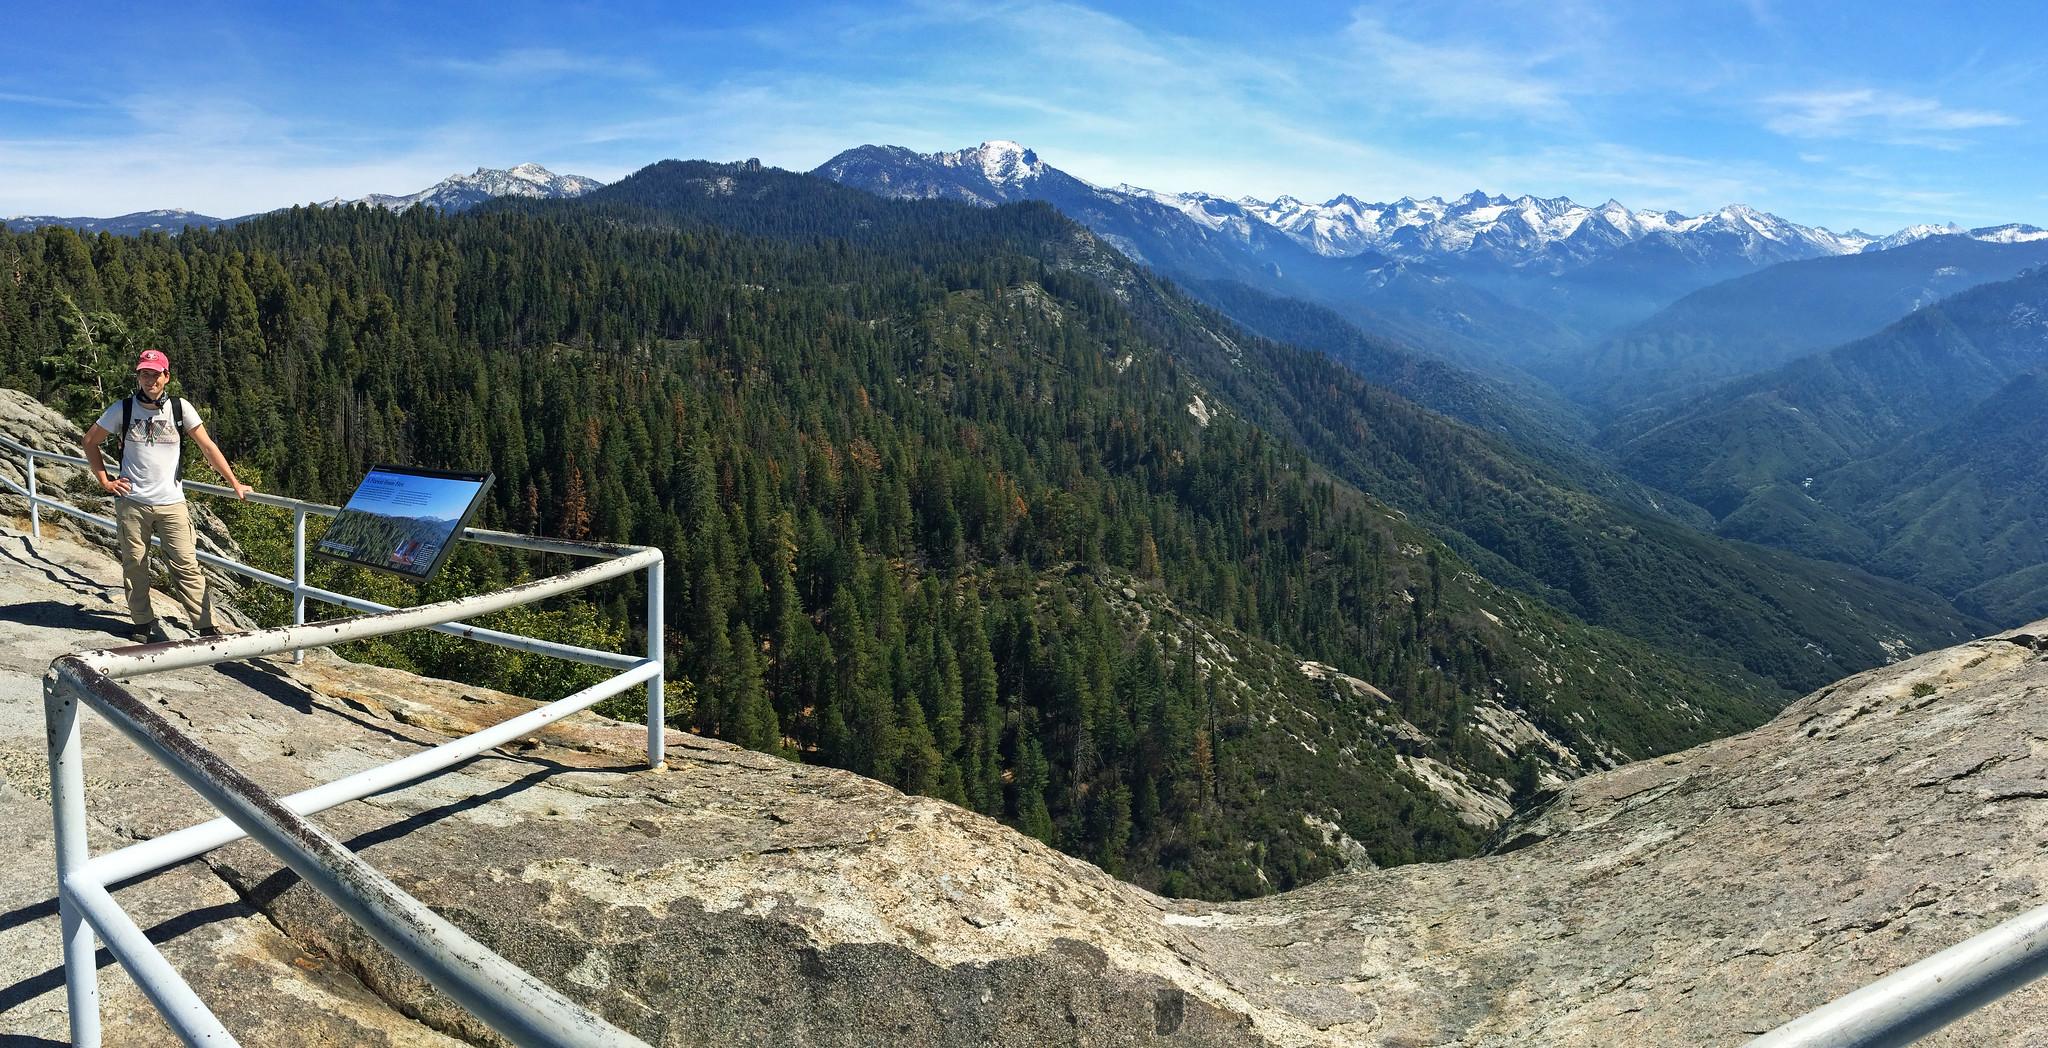 Moro Rock, Sequoia National Park, CA, USA